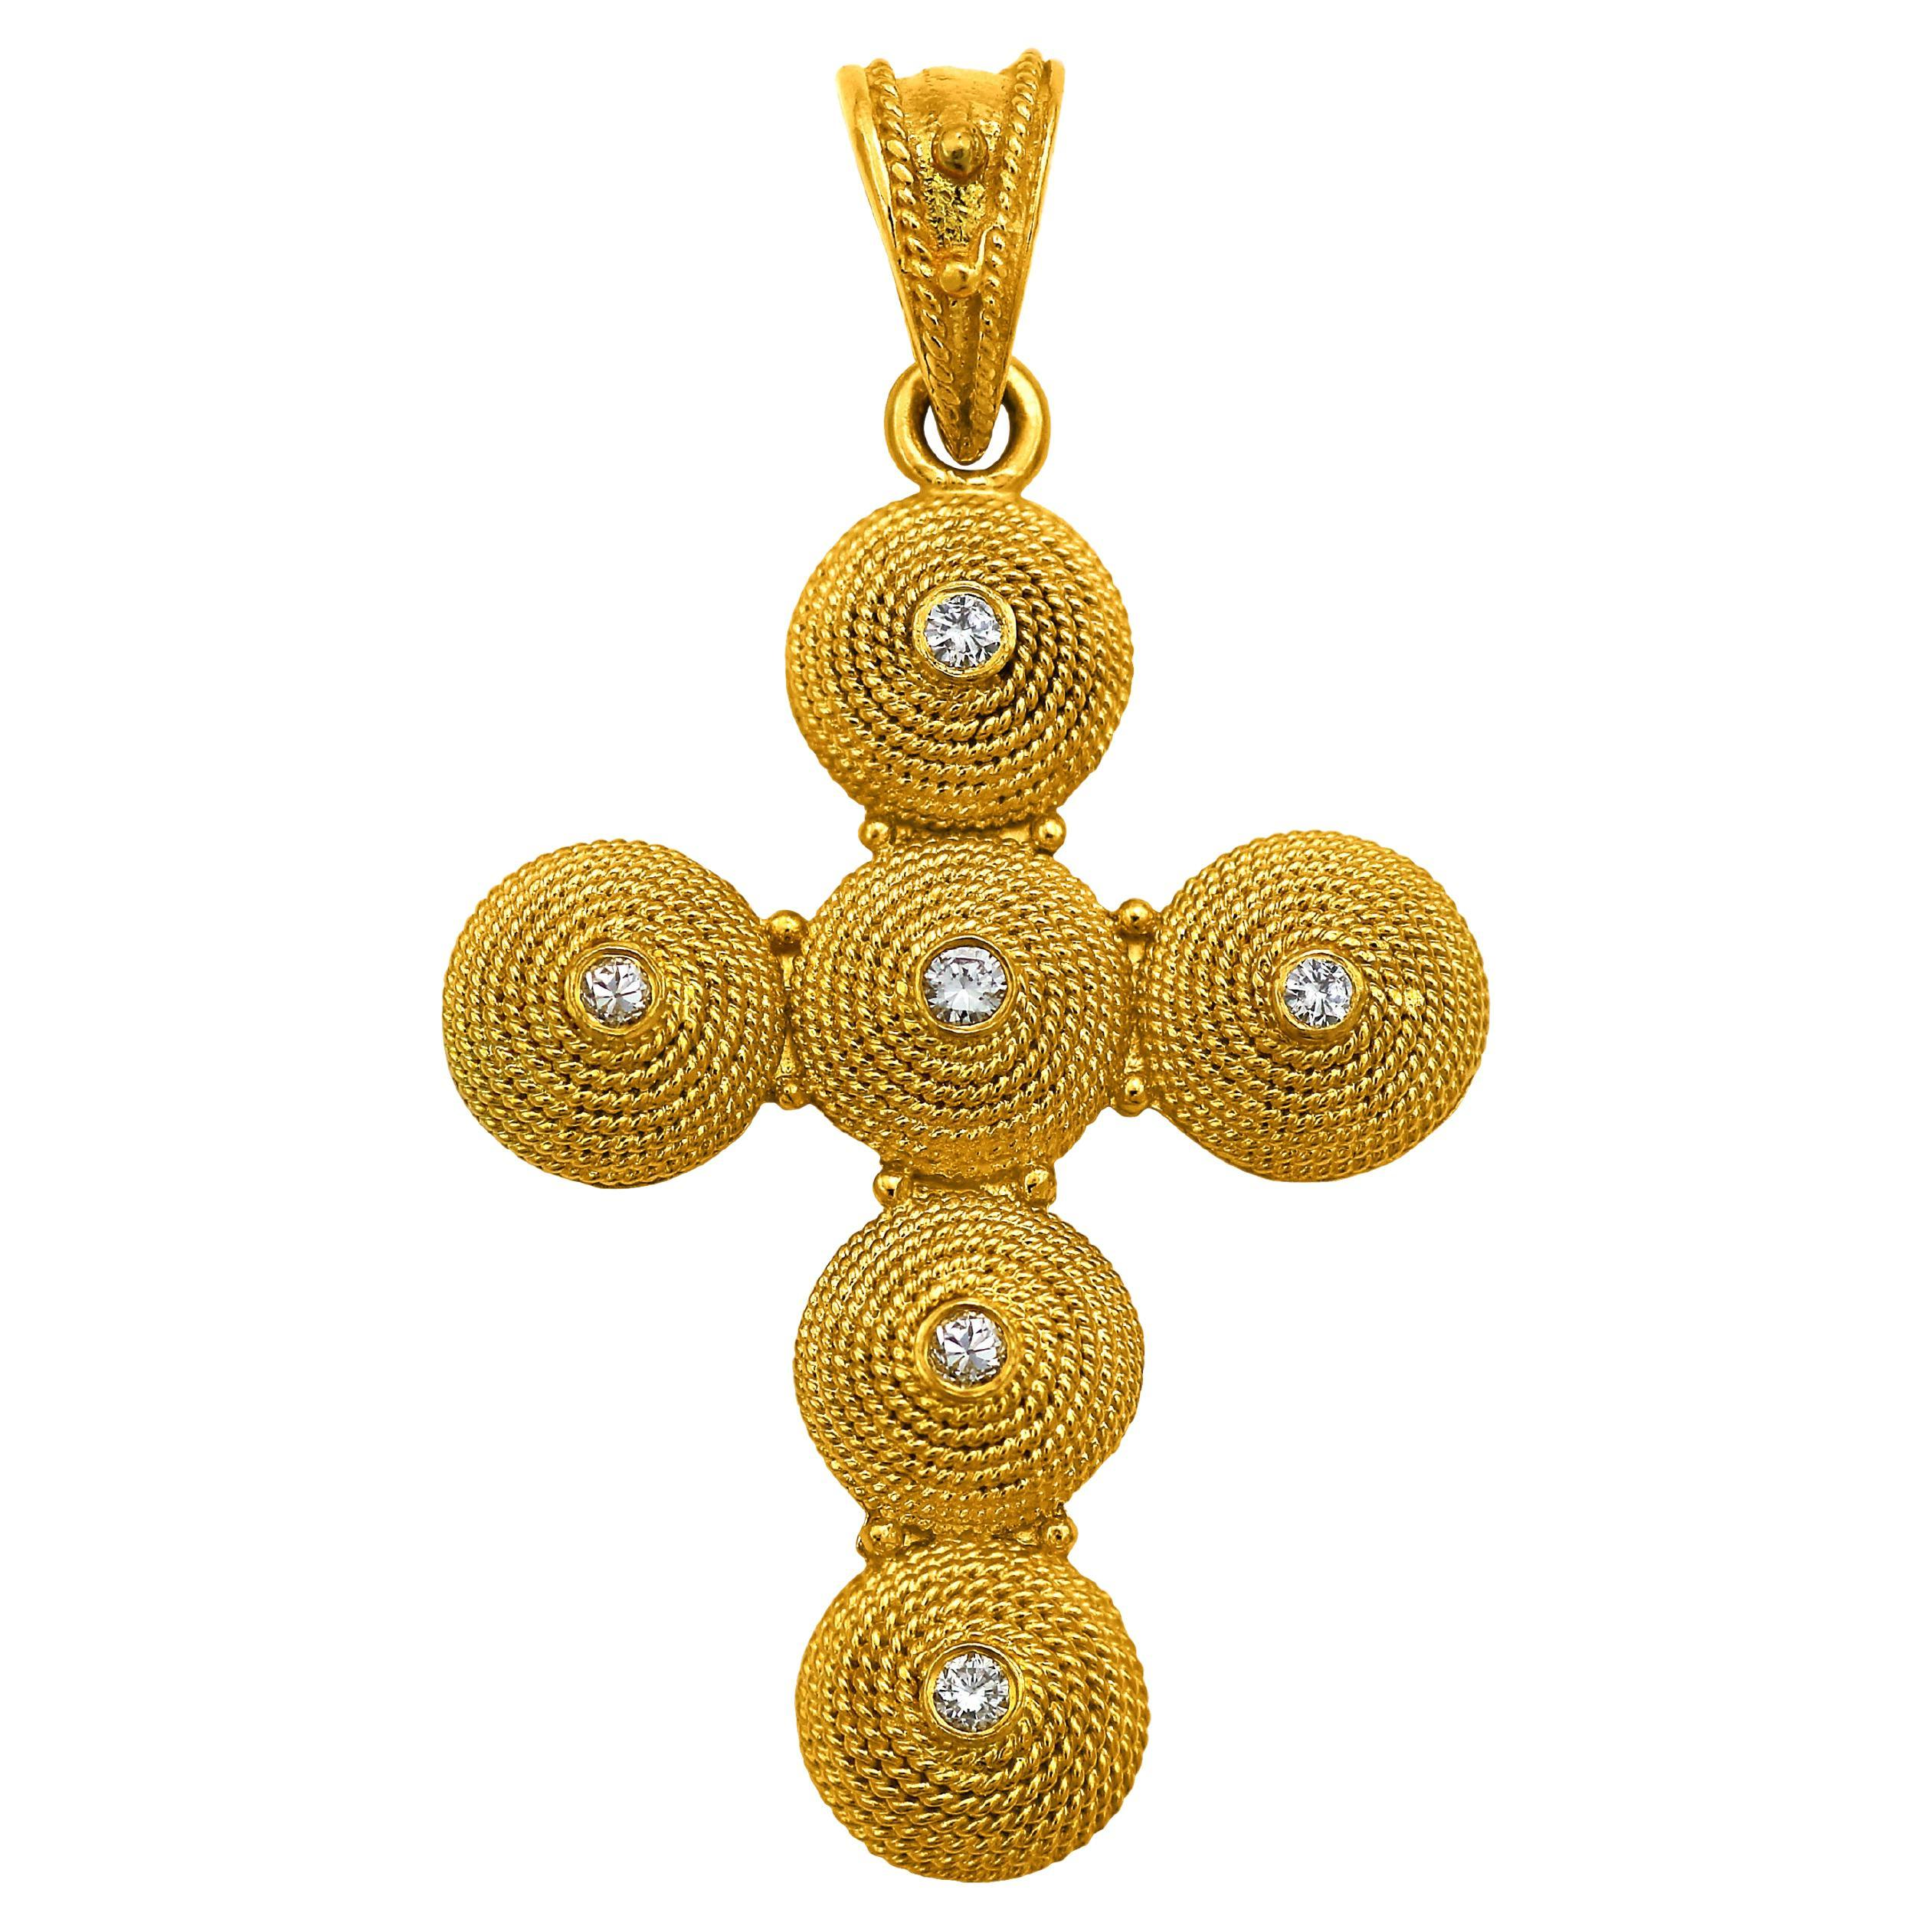 Dimos 18k Gold Filigree Cross Pendant with Diamonds